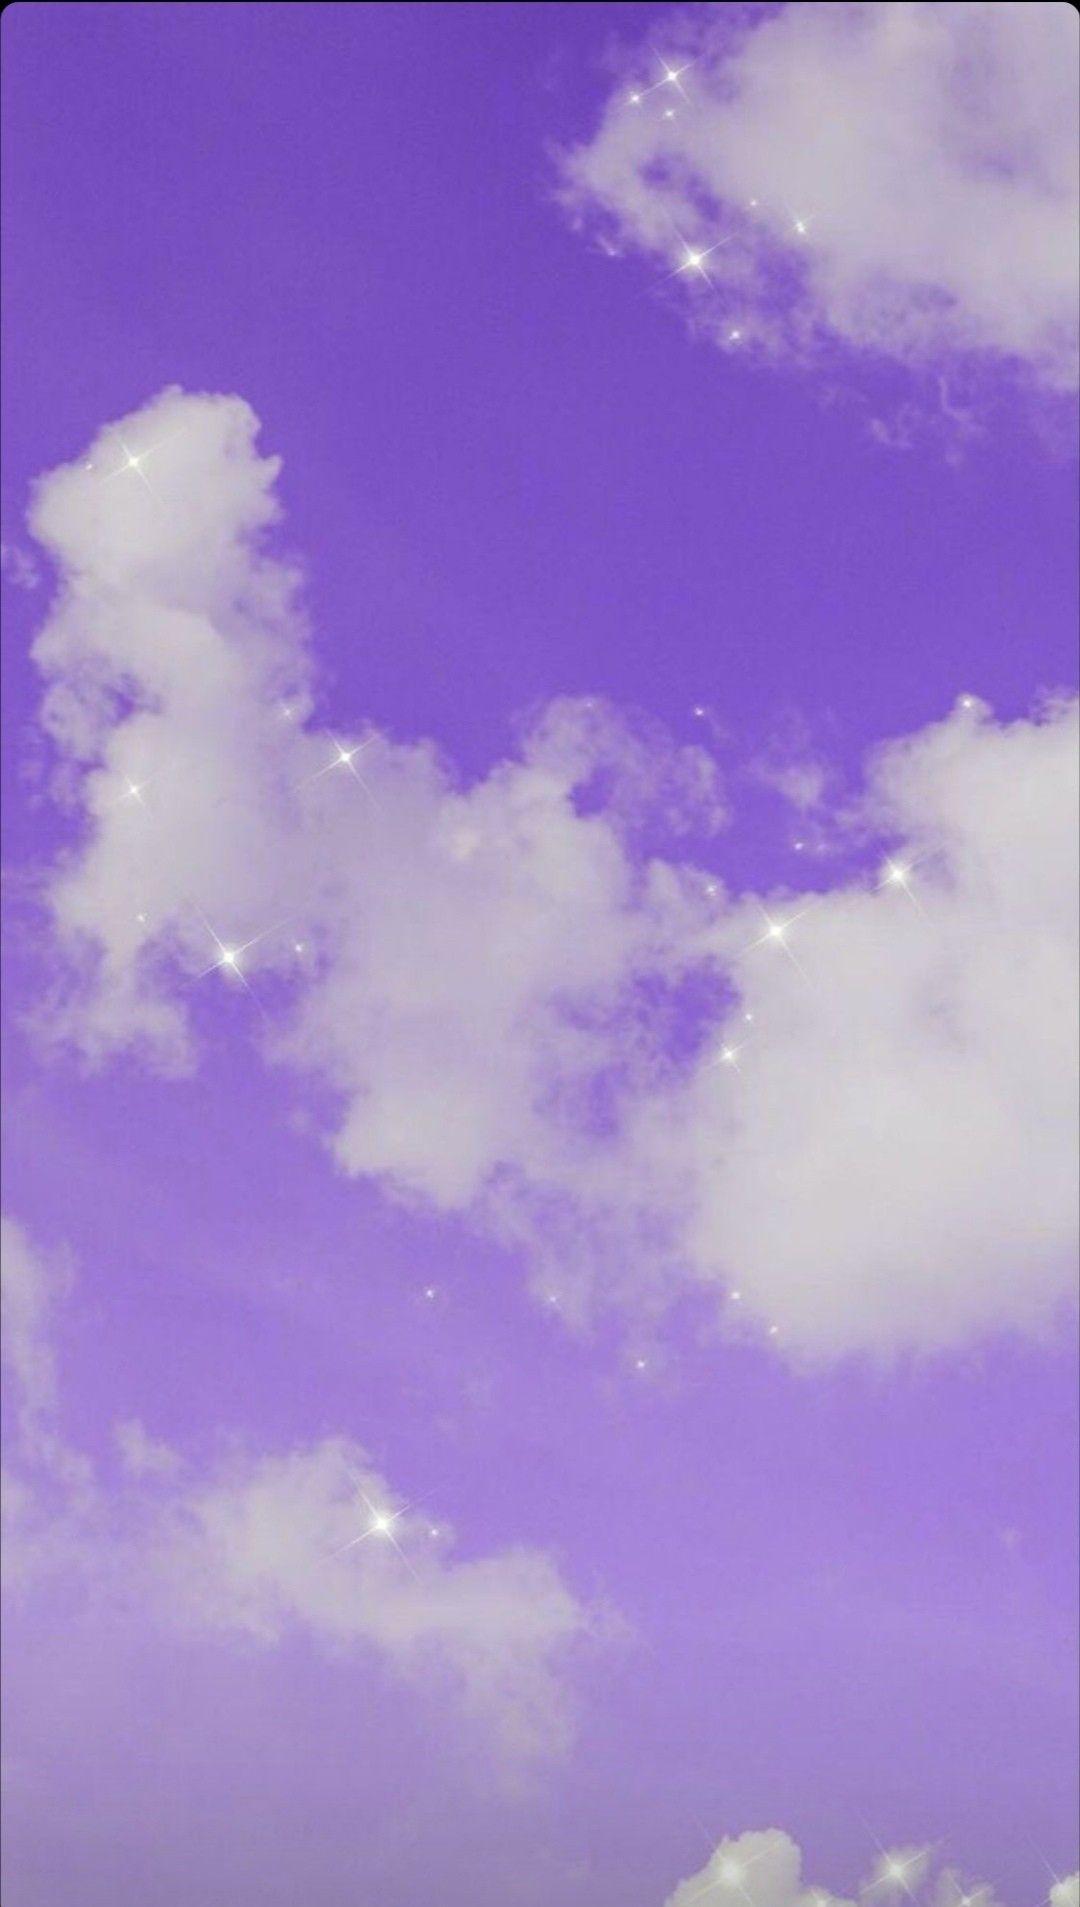 Fondo vsco in 2020   Purple wallpaper iphone, Aesthetic ...